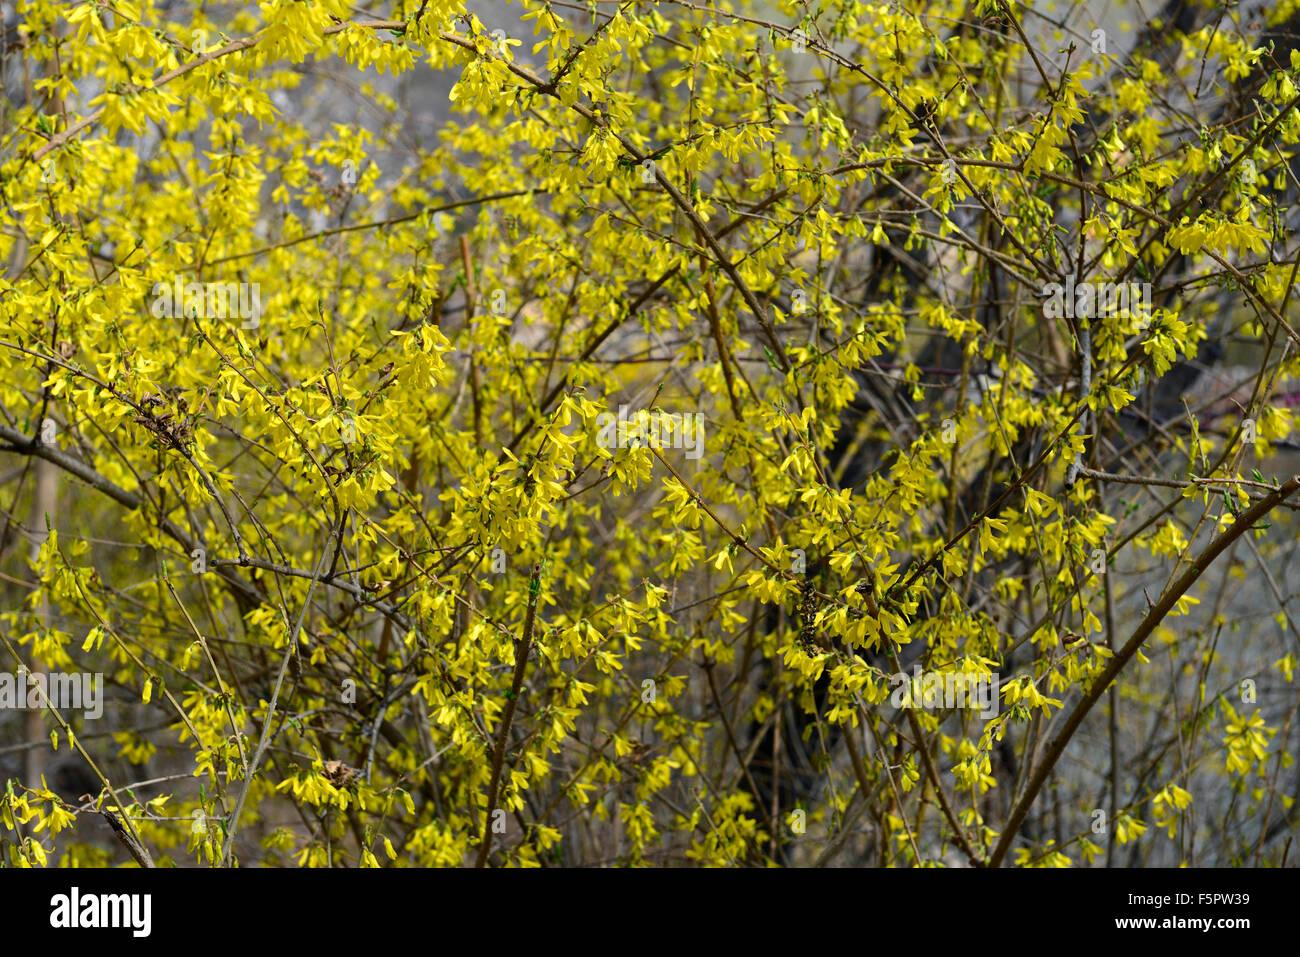 forsythia suspensa vahl weeping forsythia golden-bell yellow flower flowers flowering tree shrub RM Floral - Stock Image